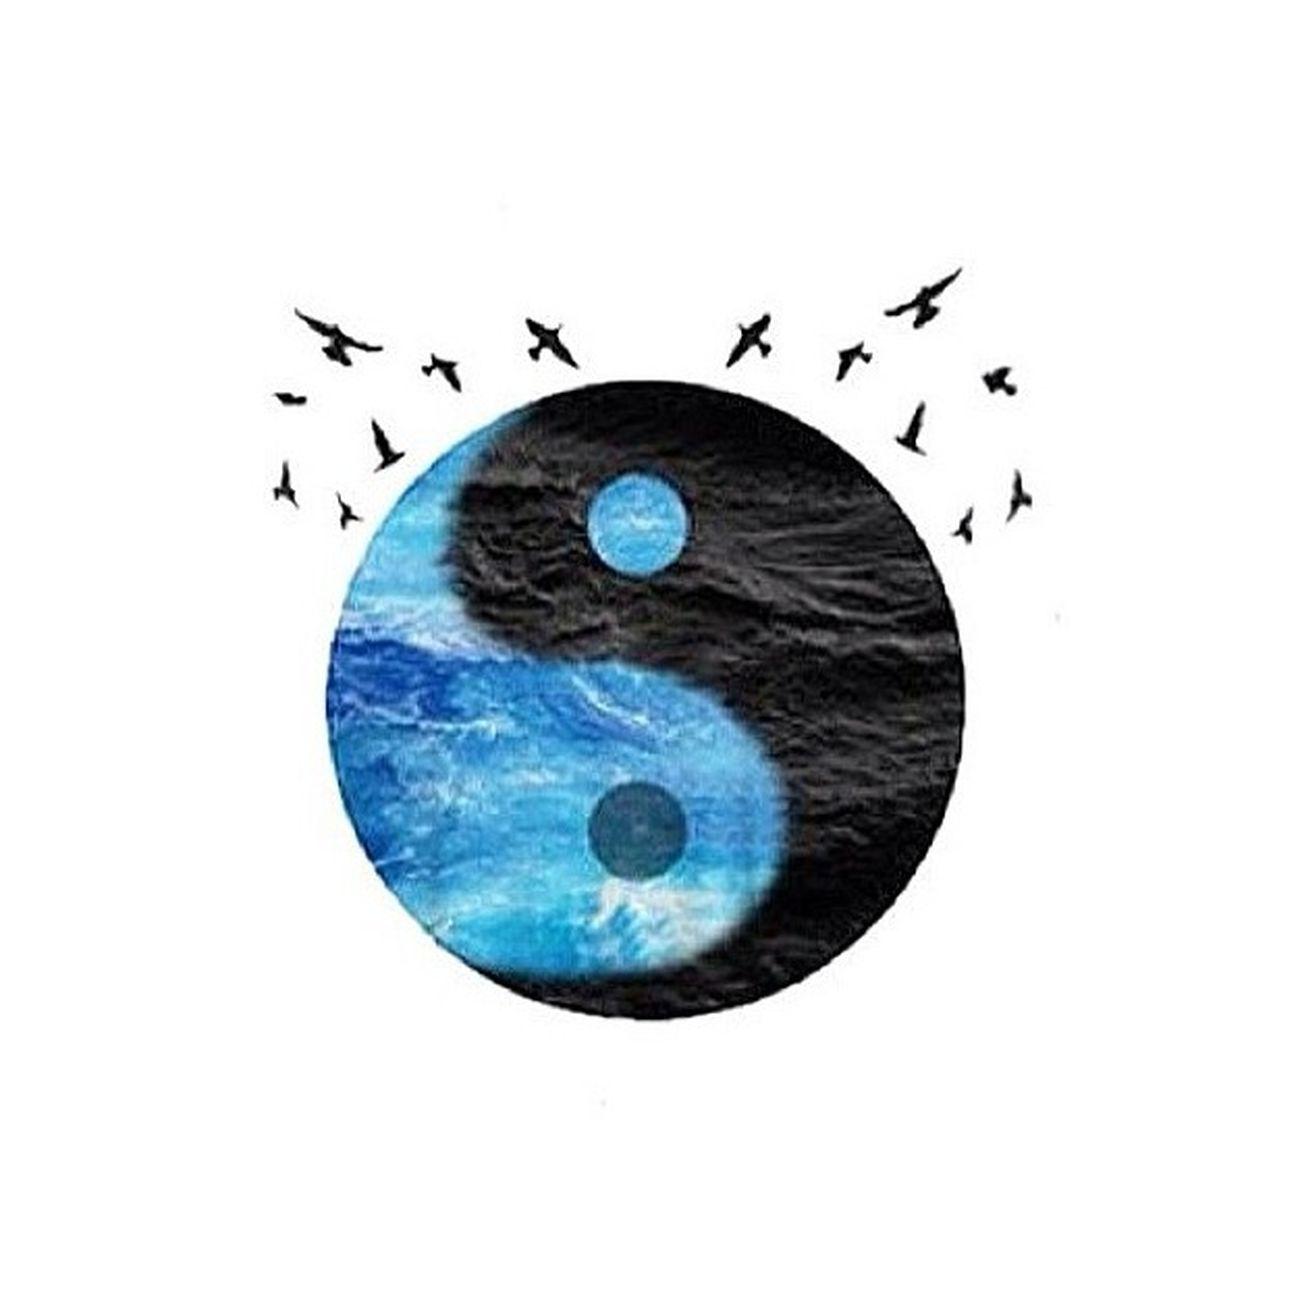 Ying Yang Inspirational Pics